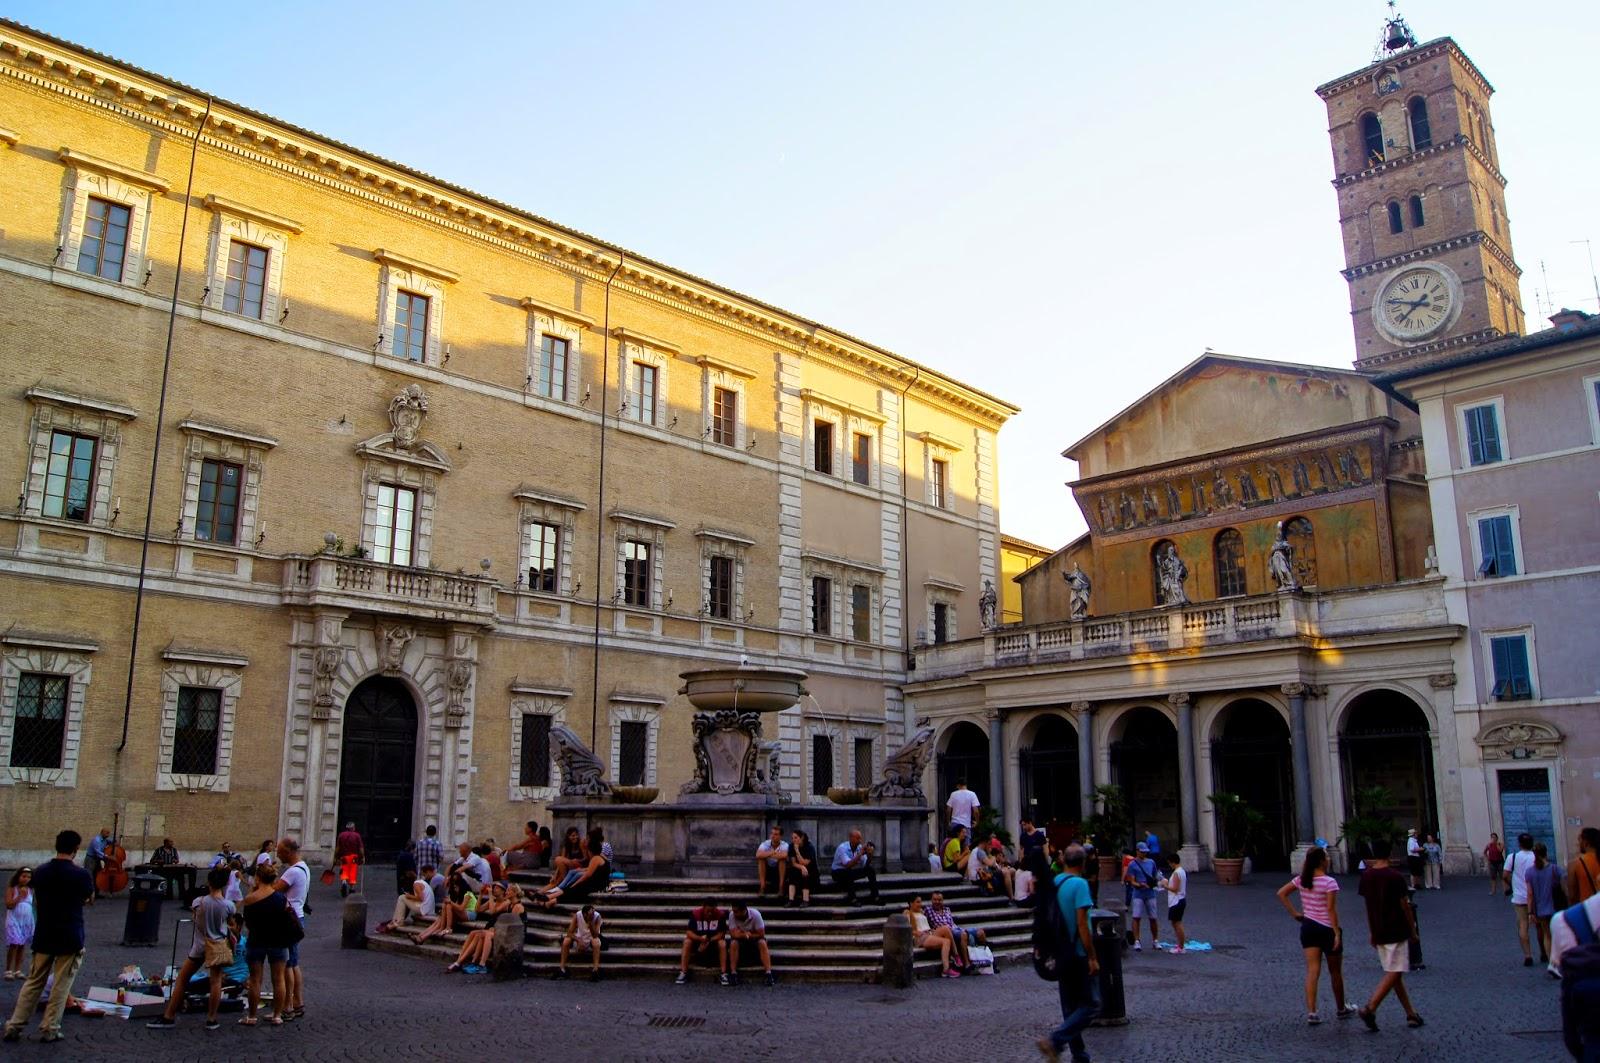 Piazza Santa Maria in Trastevere [ source ]